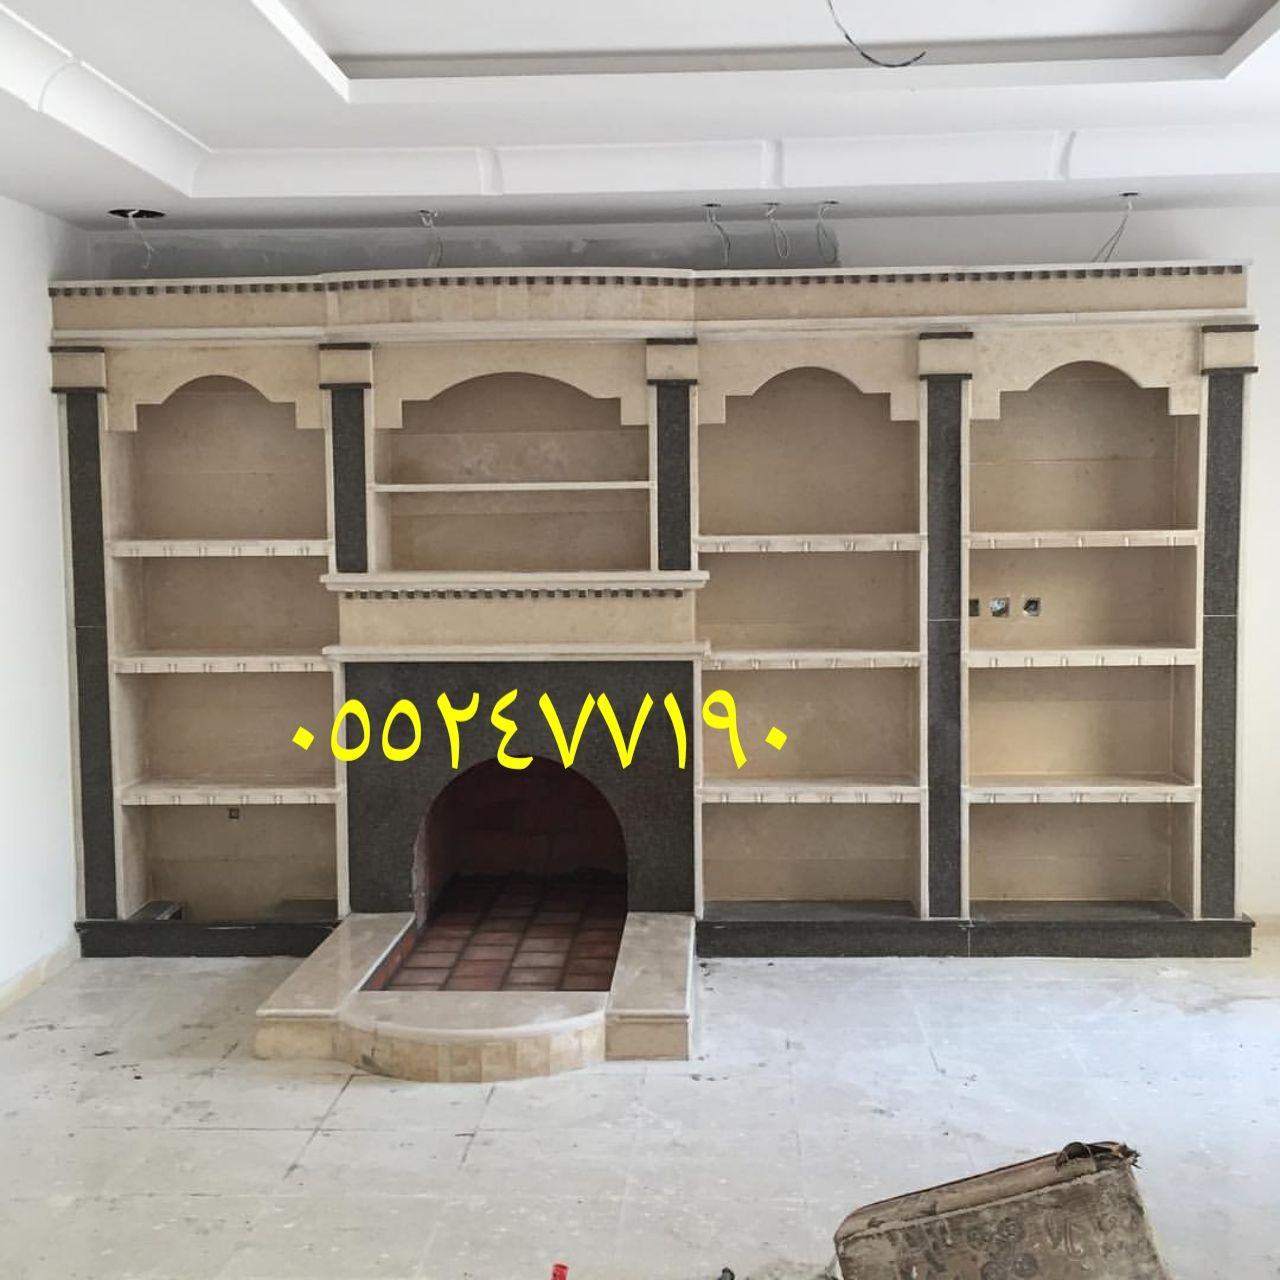 صورمشبات رخام مجالس تصاميم مجالس تراثية صورمشبات للبيع صورمشب حجر صورتصميم وجار رخام صورغرف تراثية ومشبات صورمشبات غرف ص Decor Furniture Entryway Tables